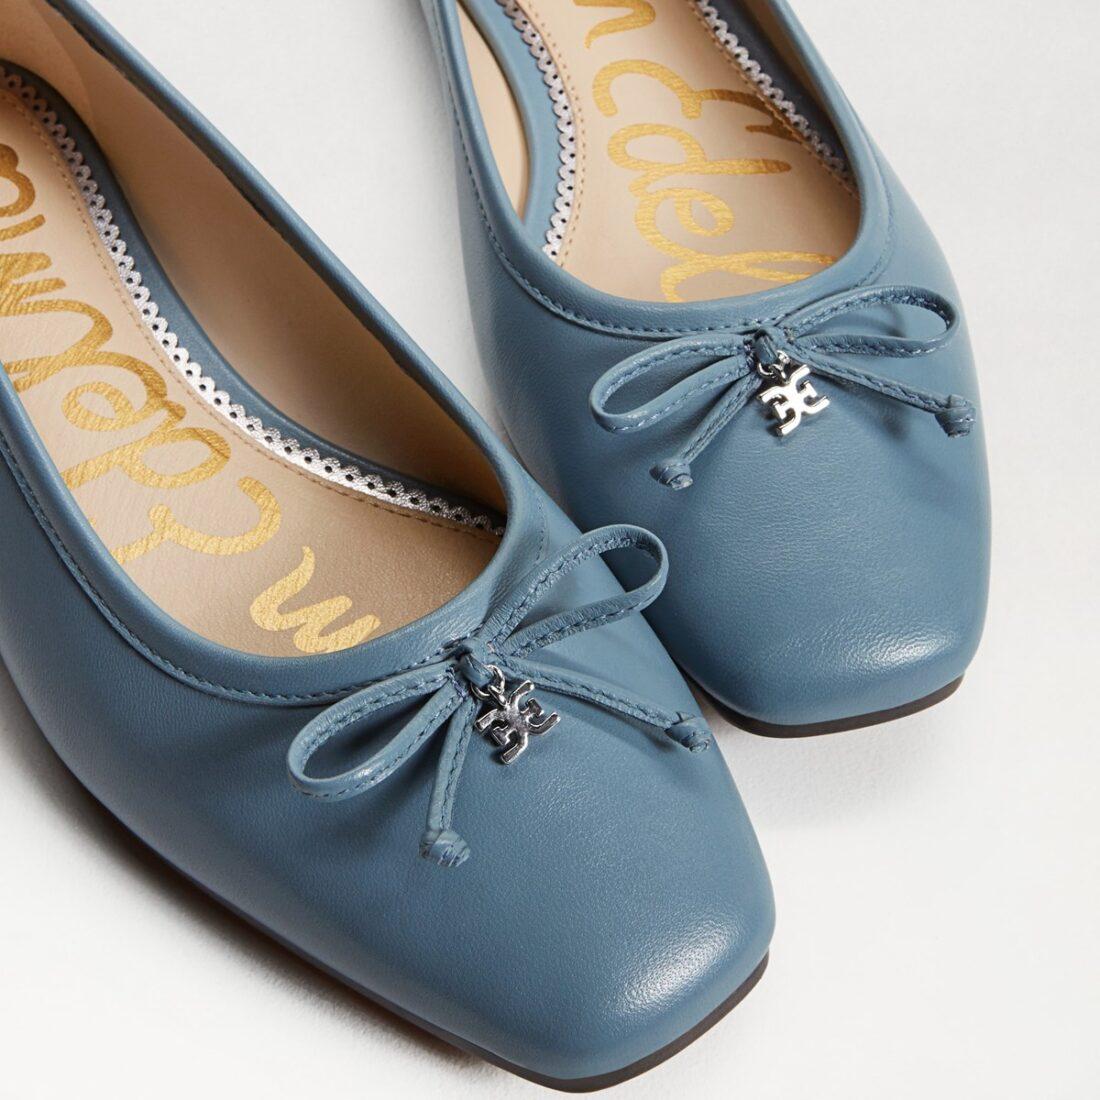 Dusty-Blue-Flats